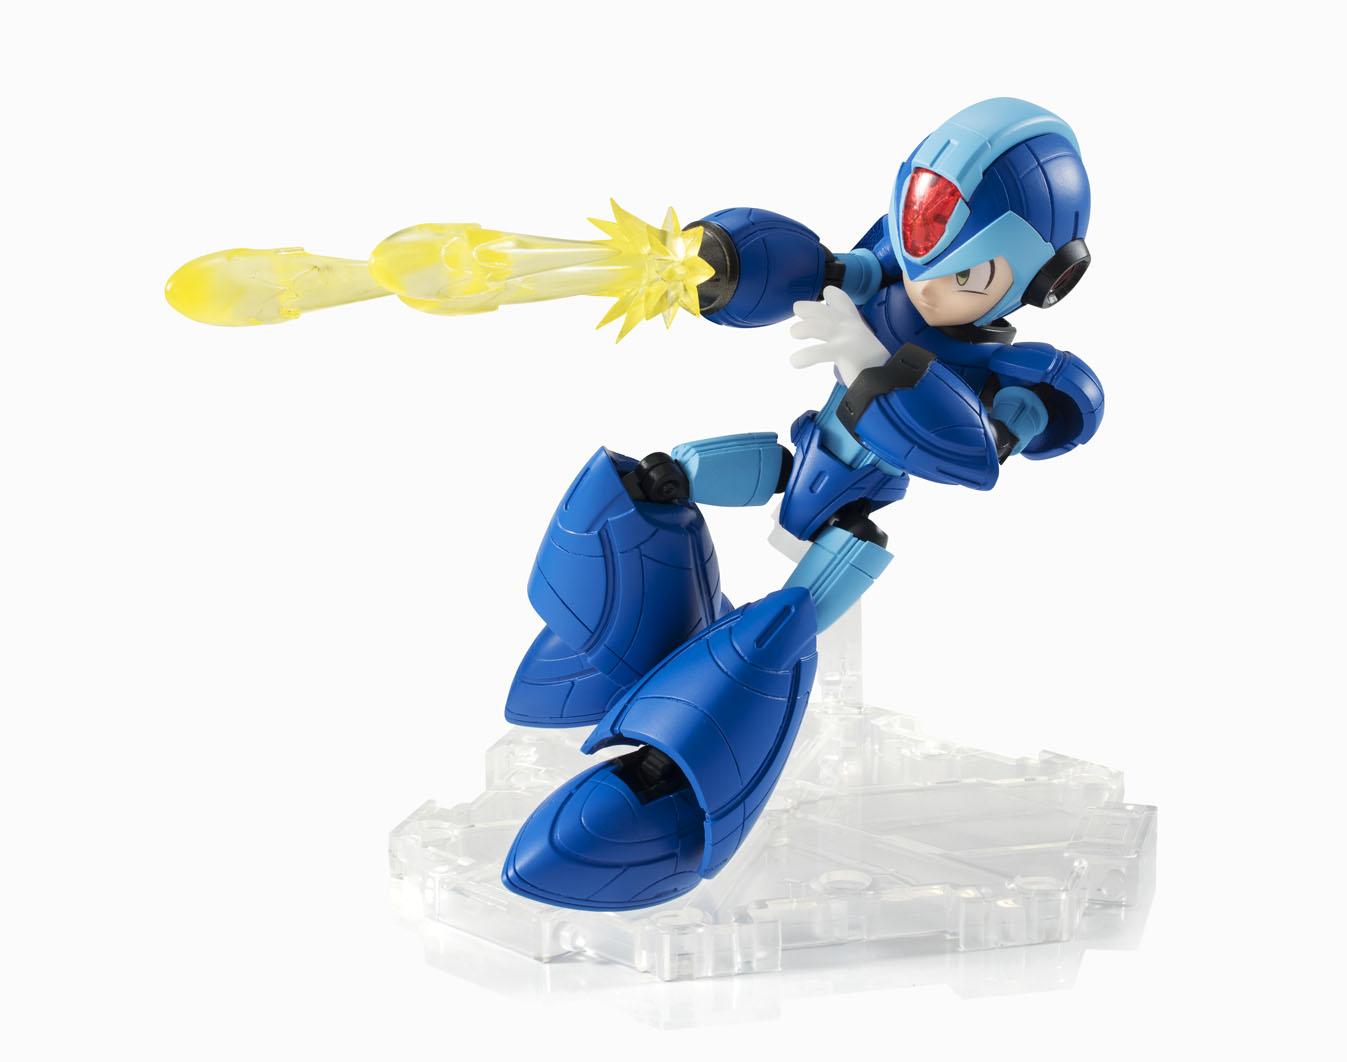 Bluefin To Distribute Nxedge Style: Mega Man Figure In U.S.